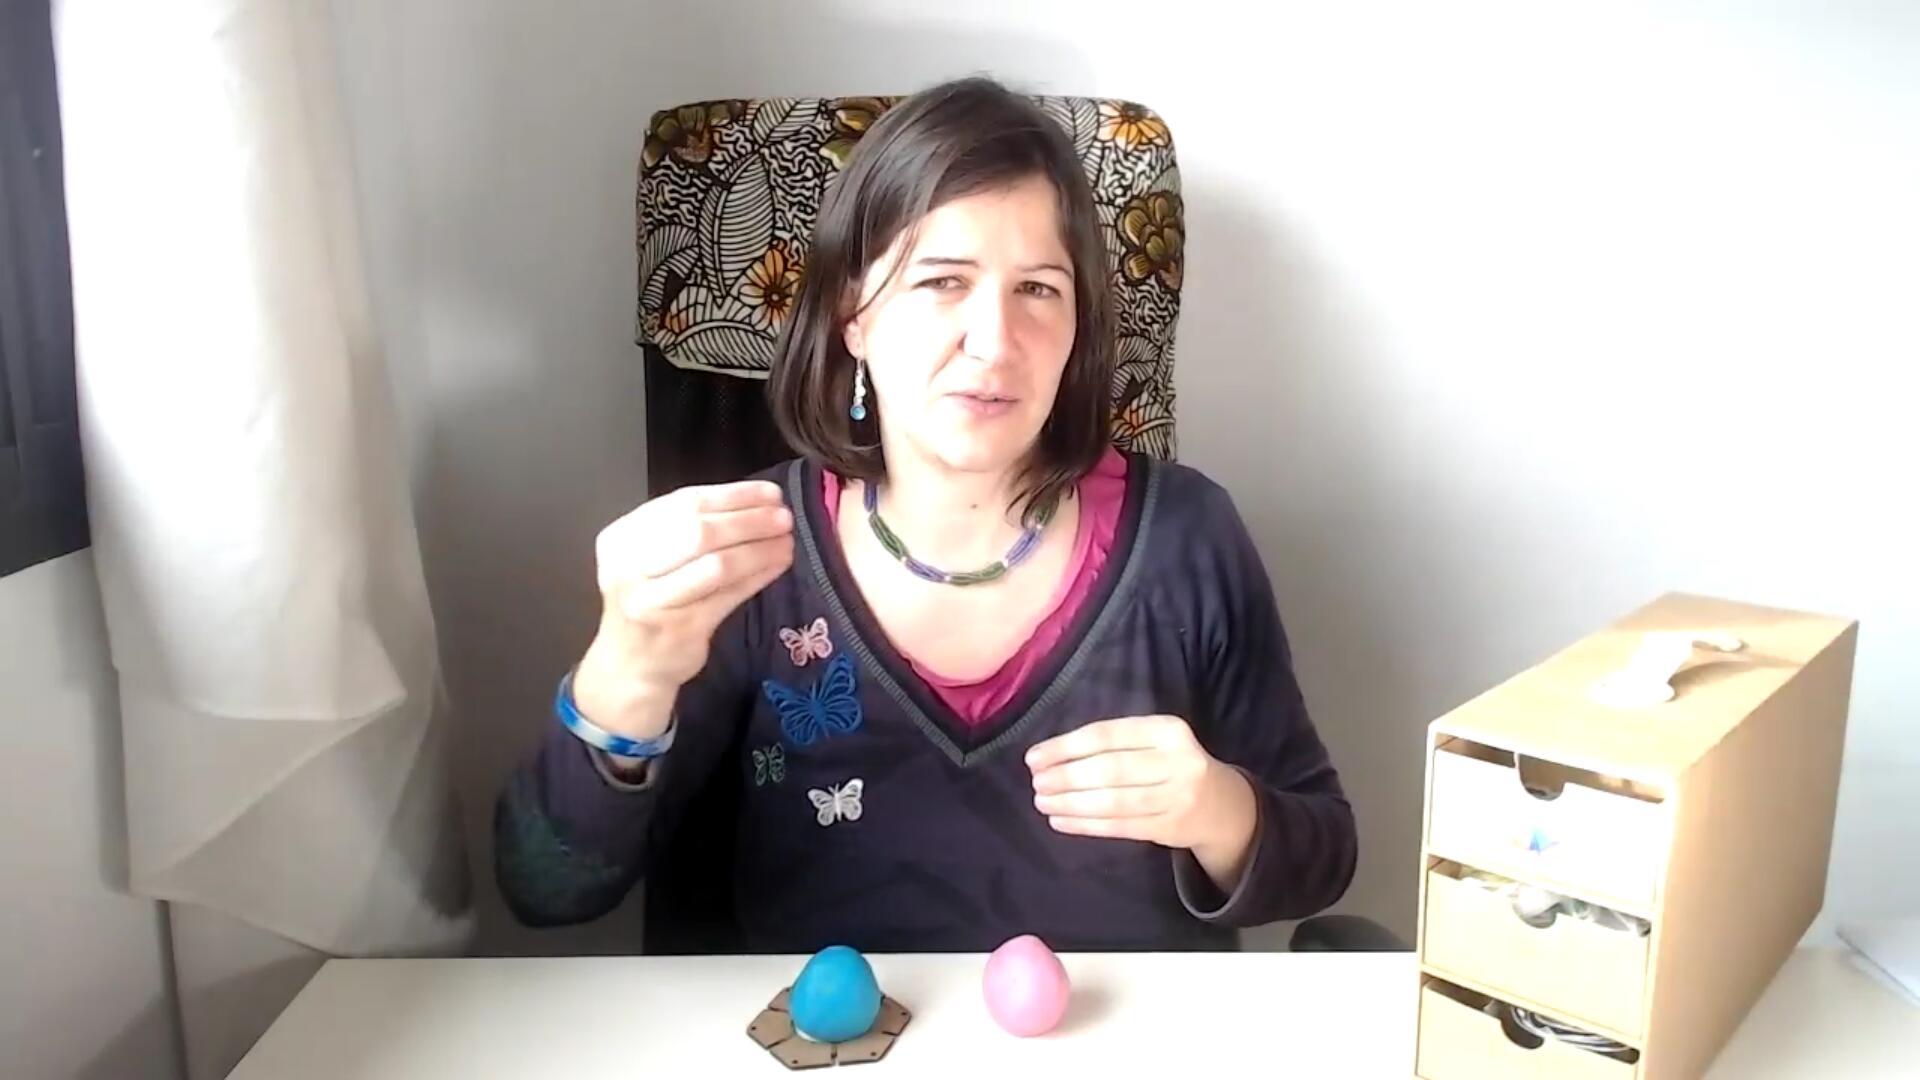 Crianza respetuosa abstracta: aprendizaje a través del juego bolas de plastilina